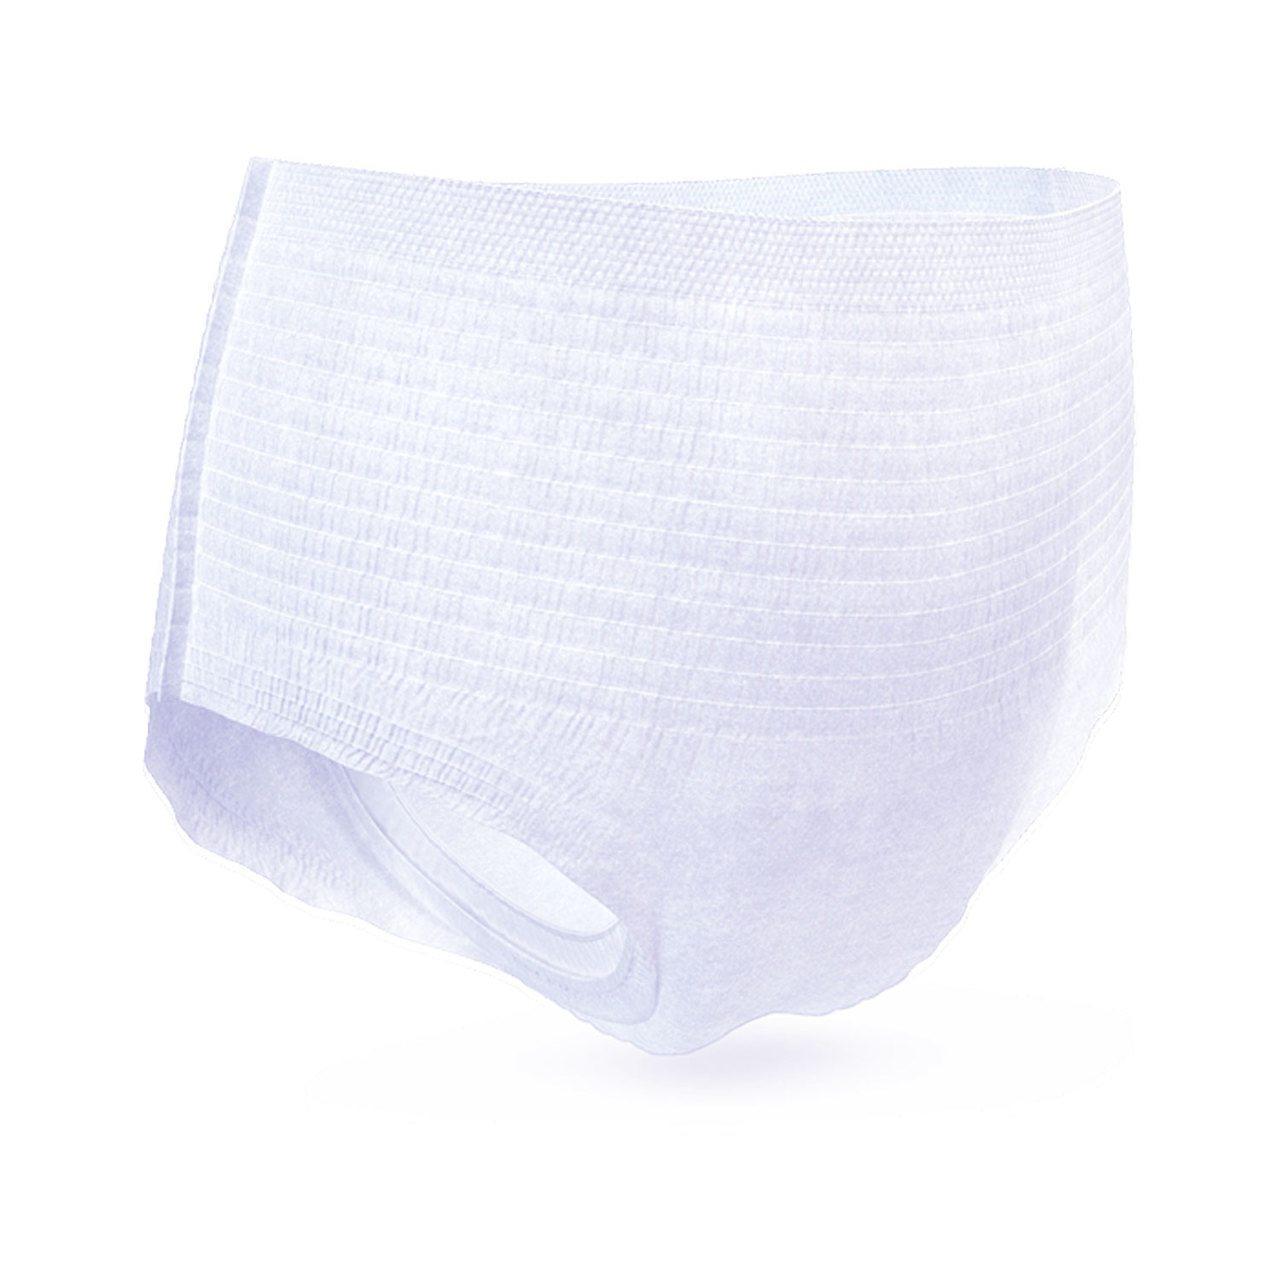 TENA Intimates Pull-Up Underwear, Overnight